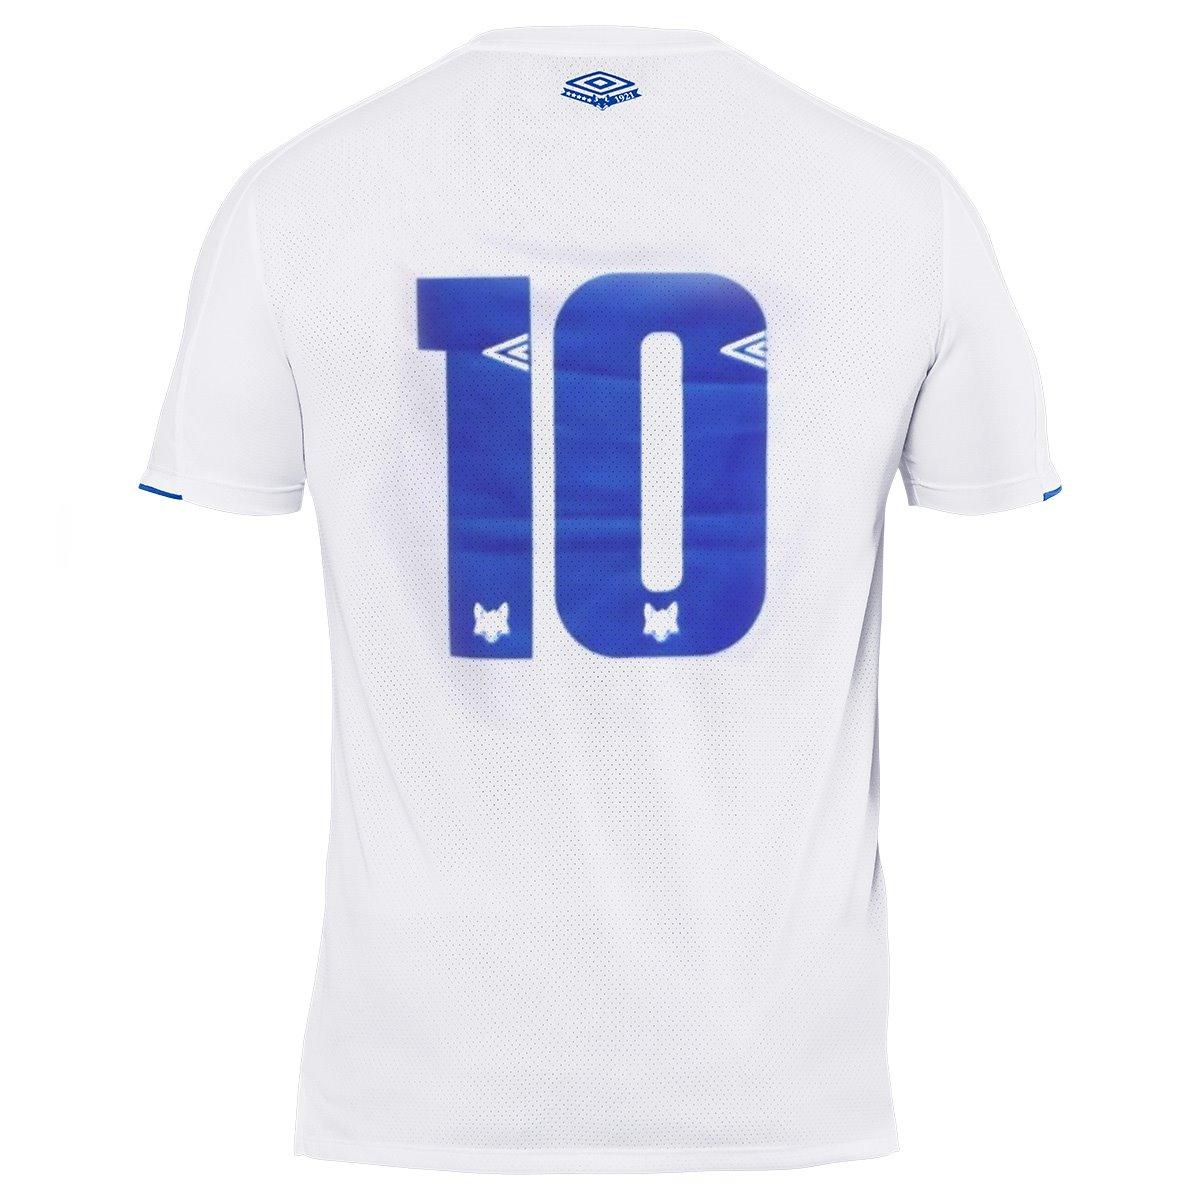 56bfbfe44f6b8 Camisa Cruzeiro 2019 II Nº 10 Umbro Classic Masculina - Branca ...